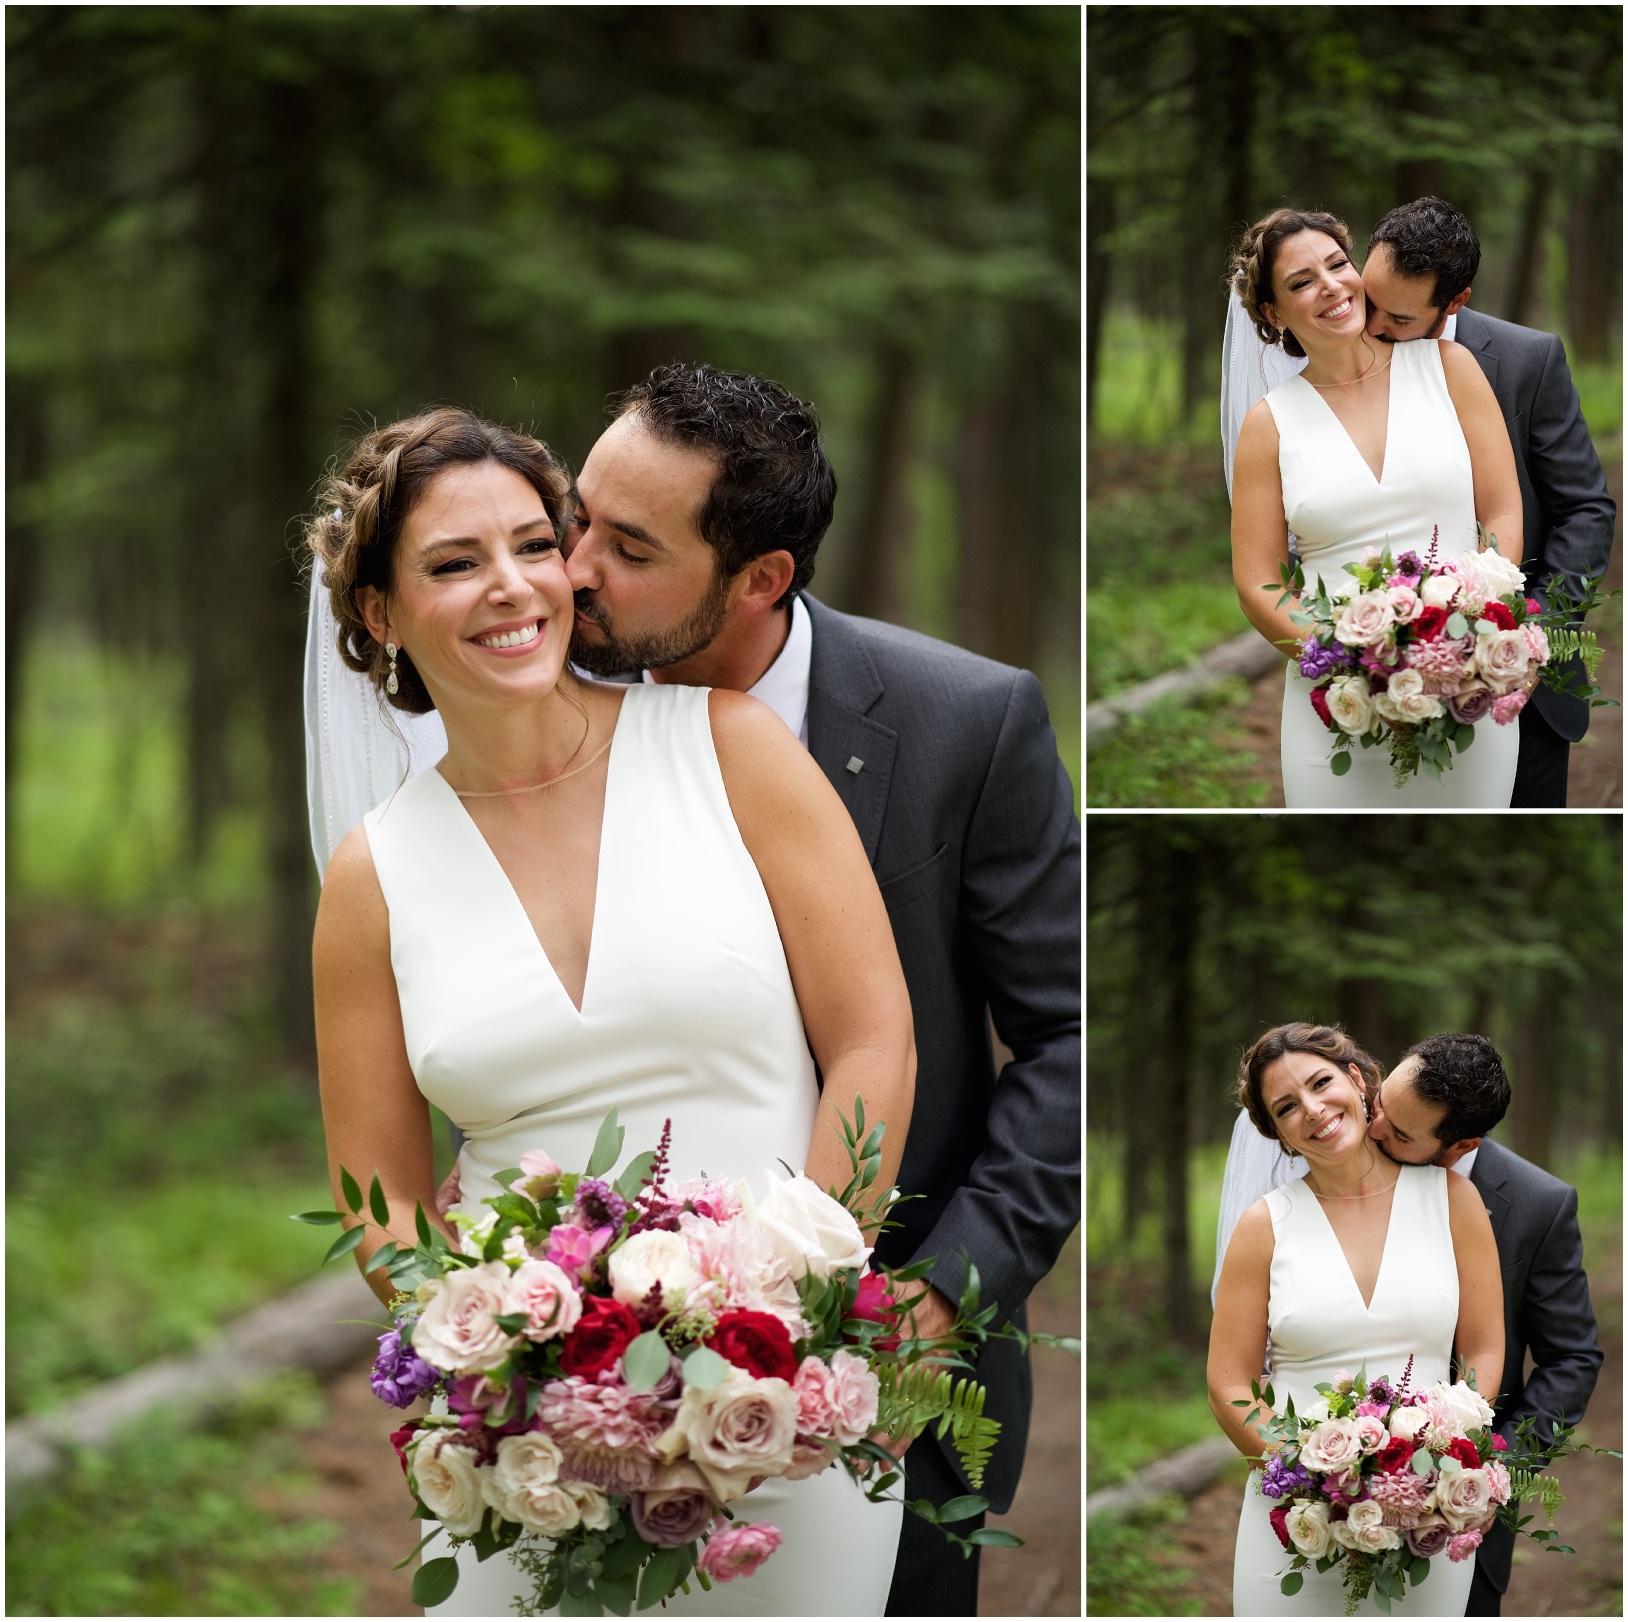 lindseyjane_wedding086.jpg